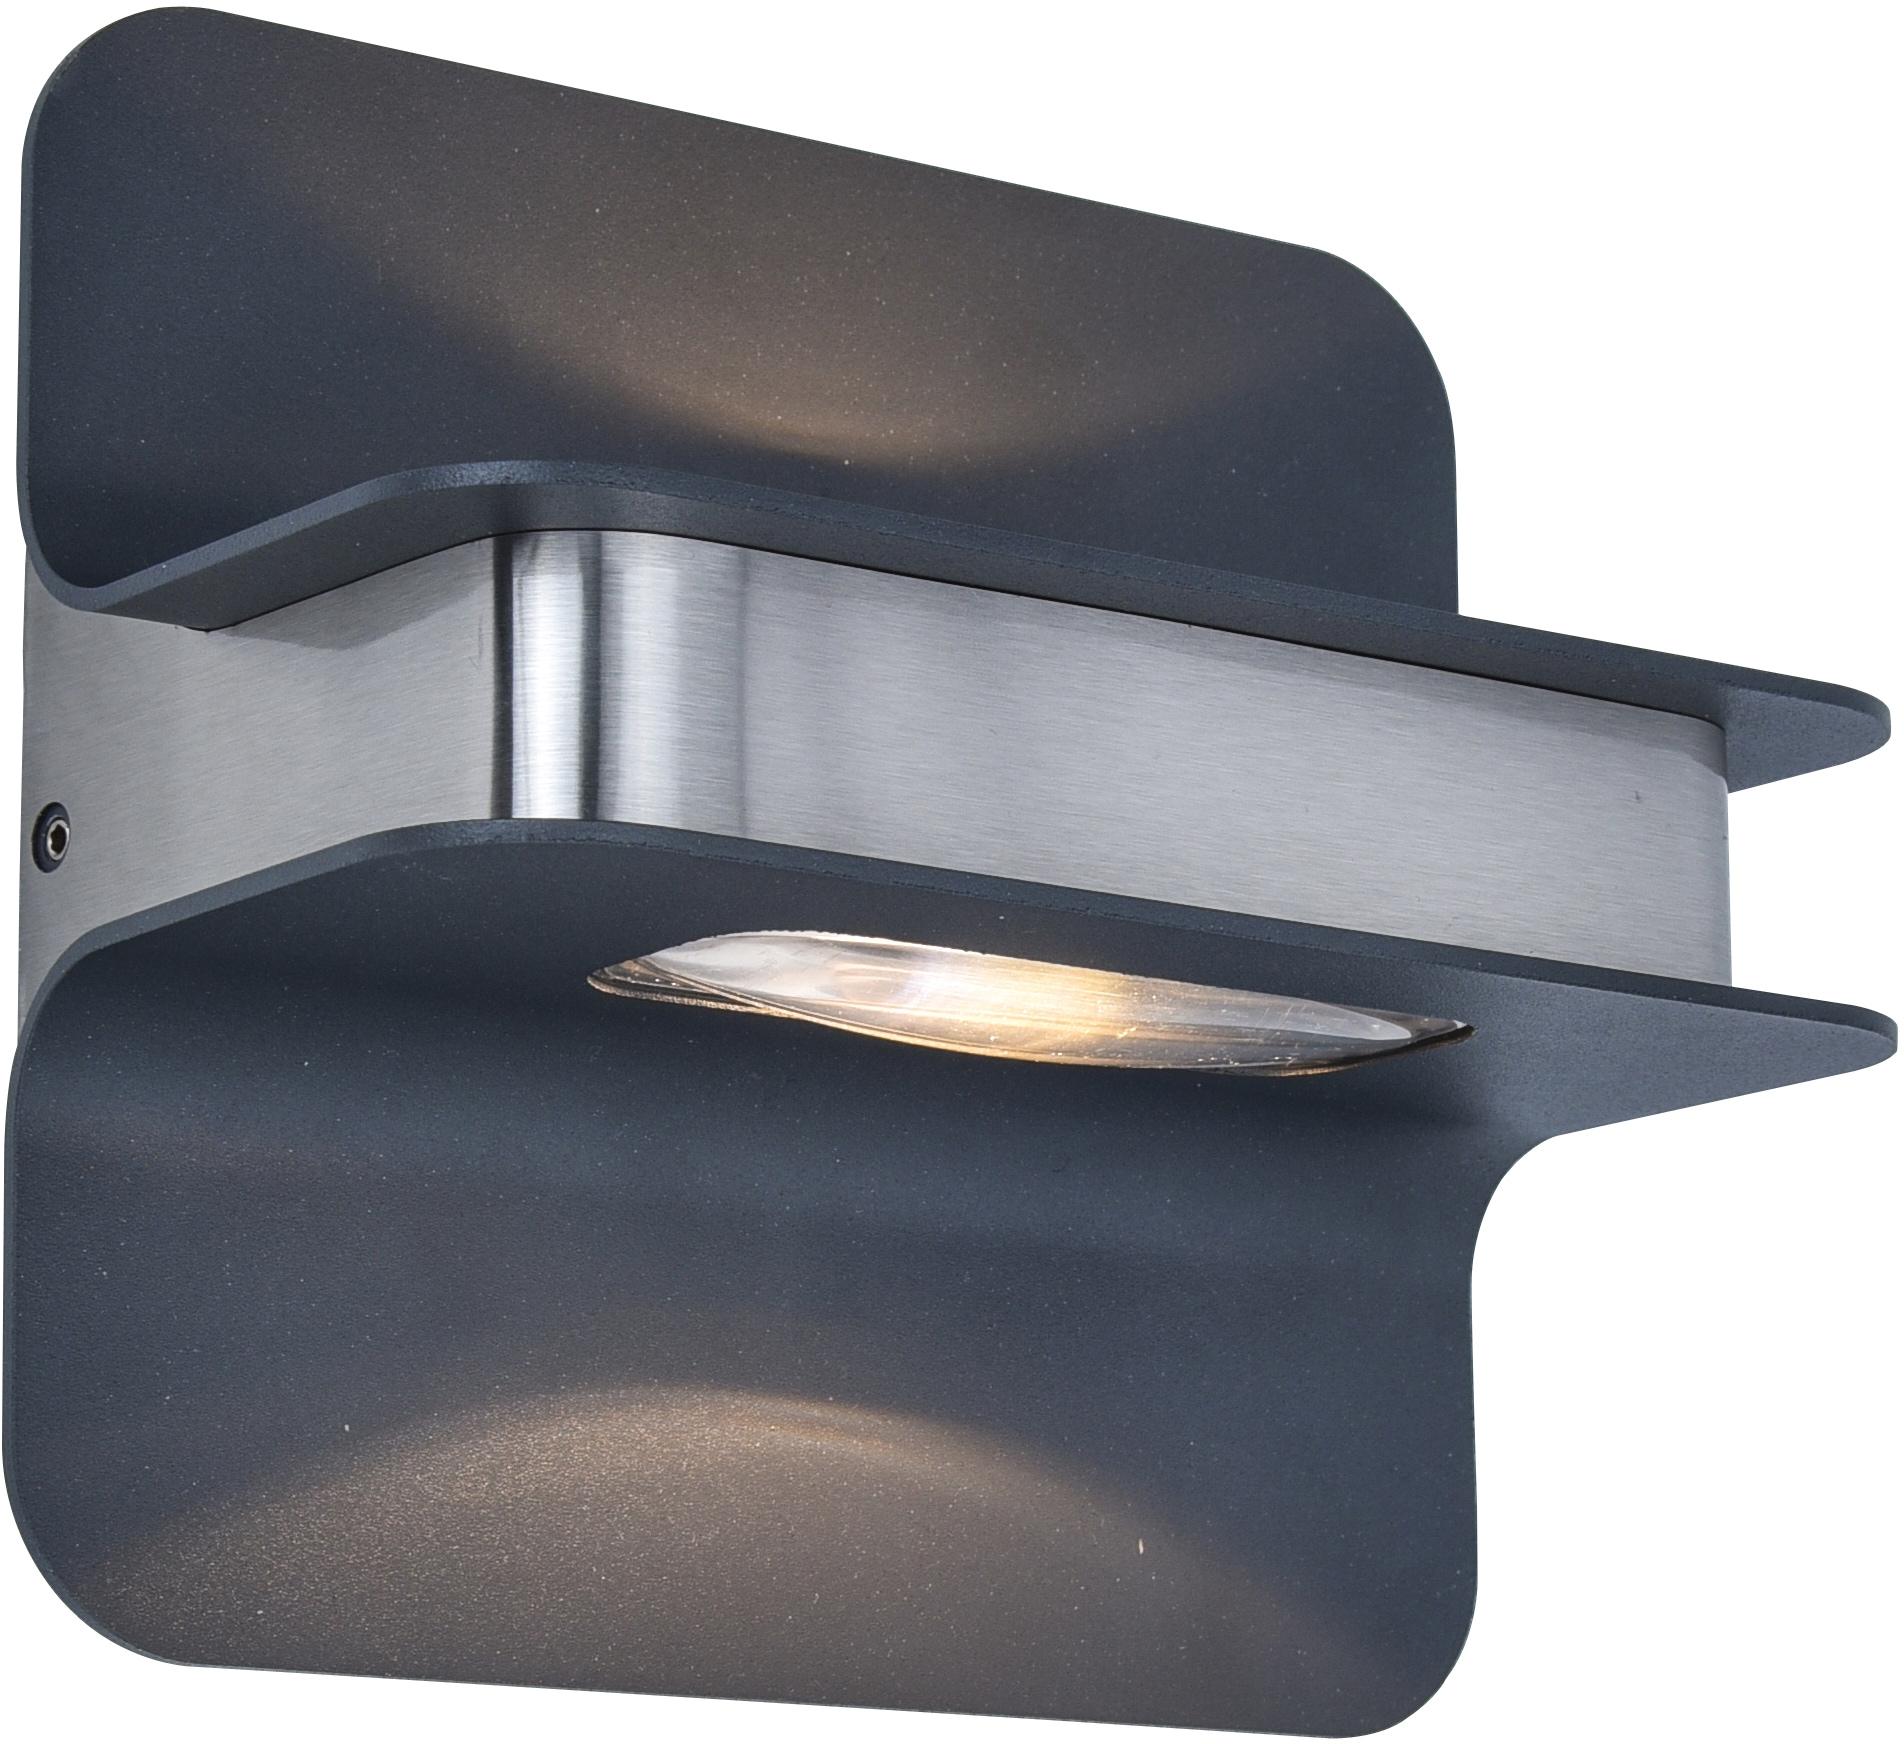 LUTEC LED Außen-Wandleuchte HILL 5195801001, LED-Modul, 1 St., Warmweiß